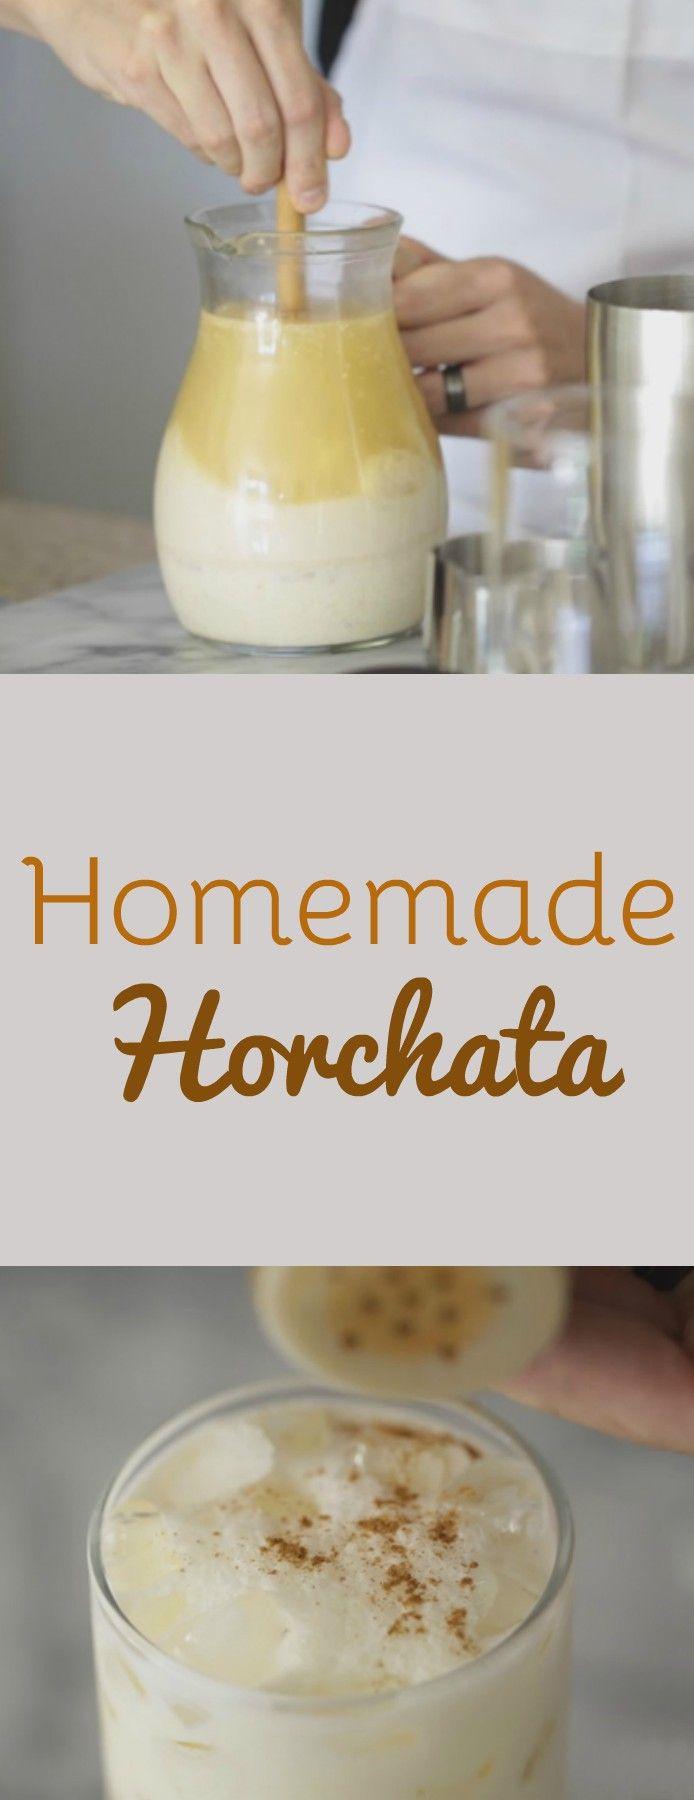 Refreshing Ice Cold Horchata Recipe | Homemade Recipes at http://homemaderecipes.com/how-to-make-horchata/